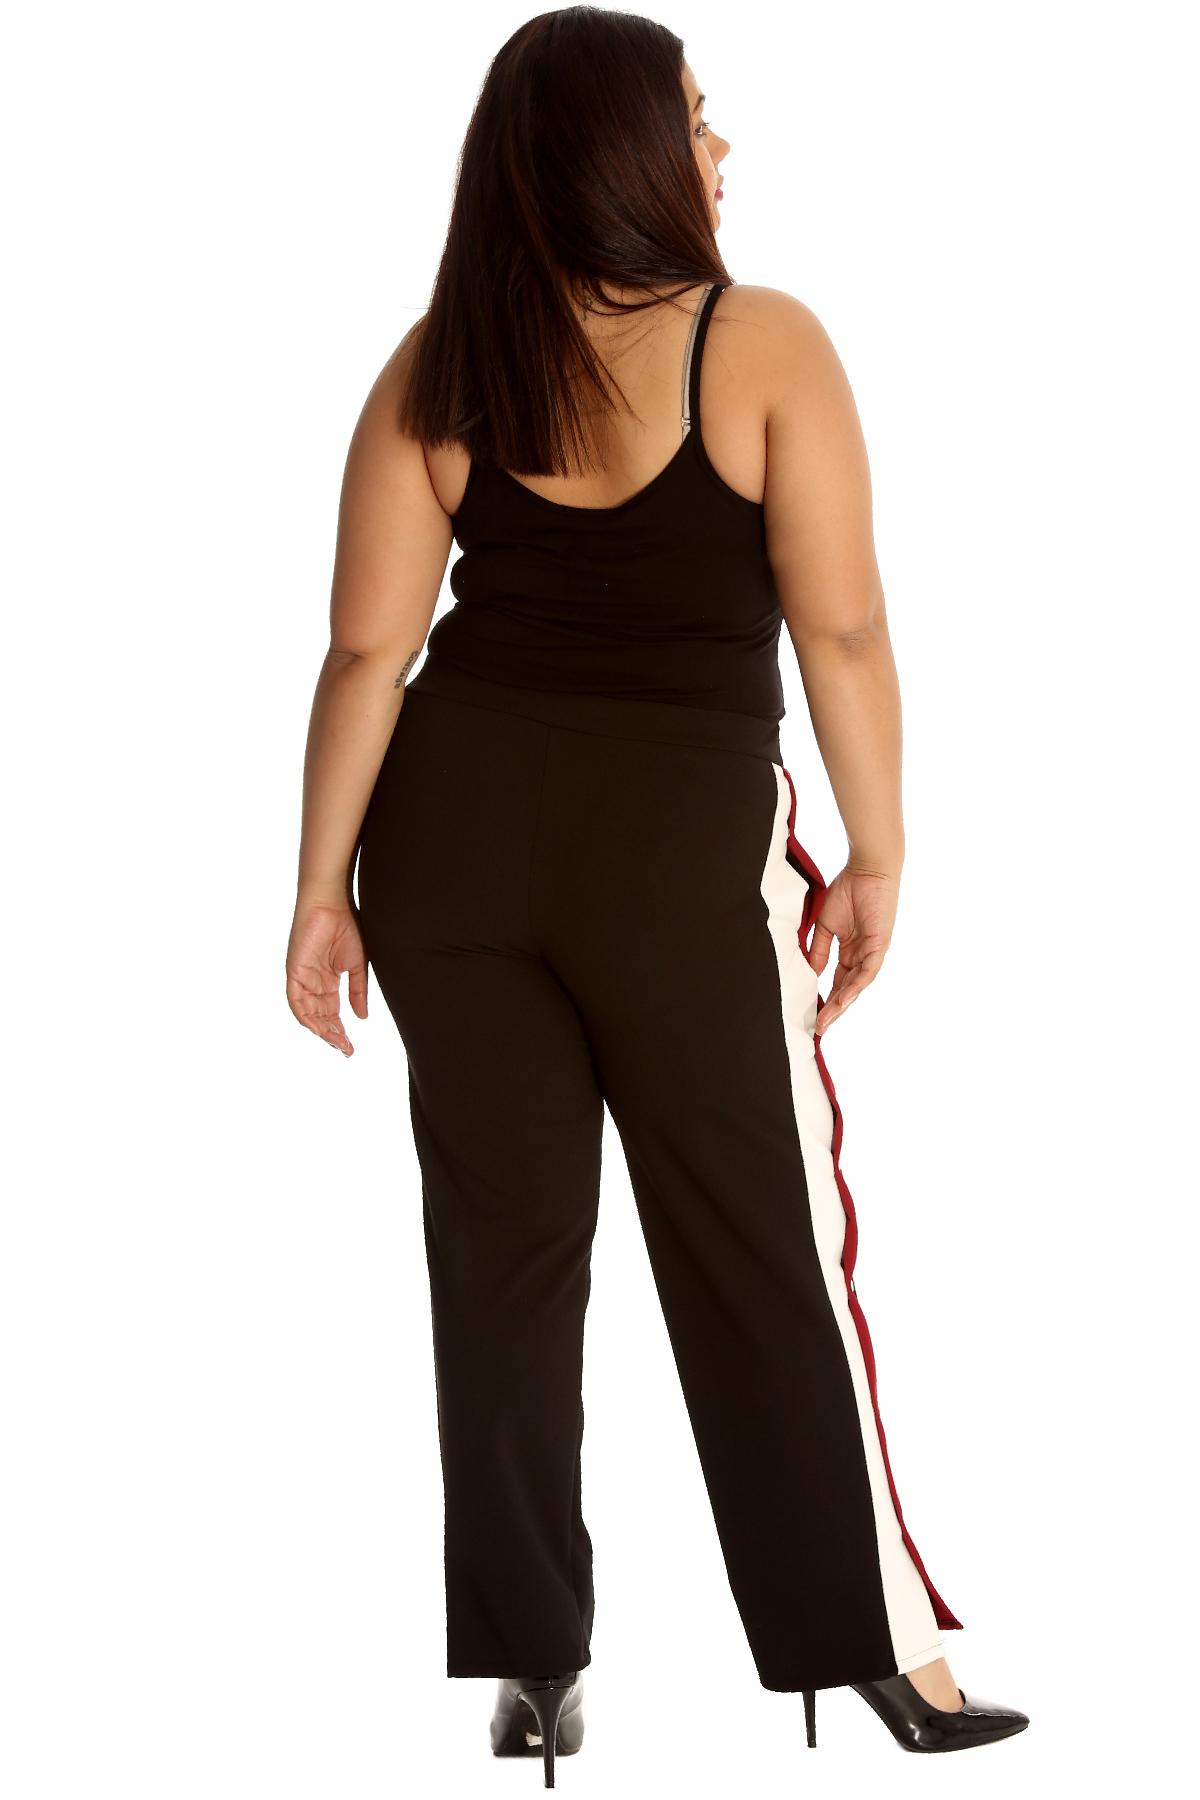 12bb88a4b99 New Ladies Trousers Plus Size Womens Bottoms Popper Button Stripe ...